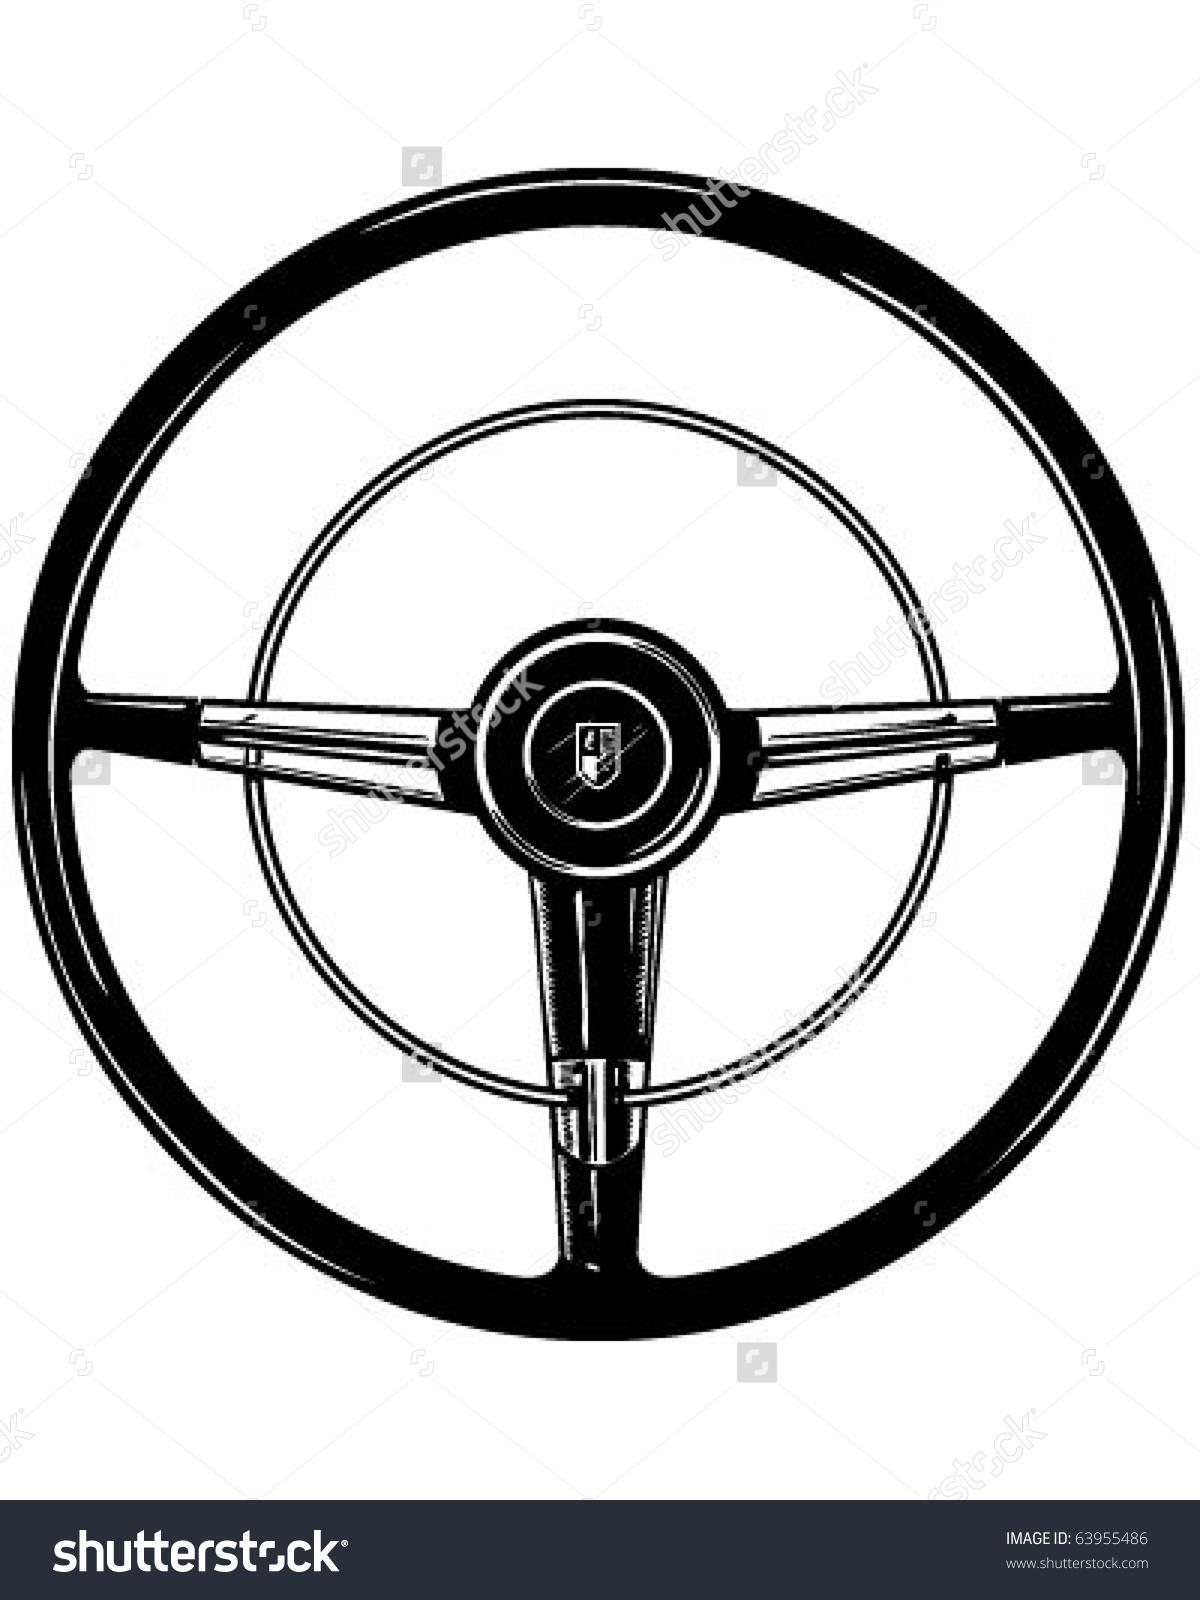 Retro Steering Wheel - Clipart | Clipart Panda - Free ...